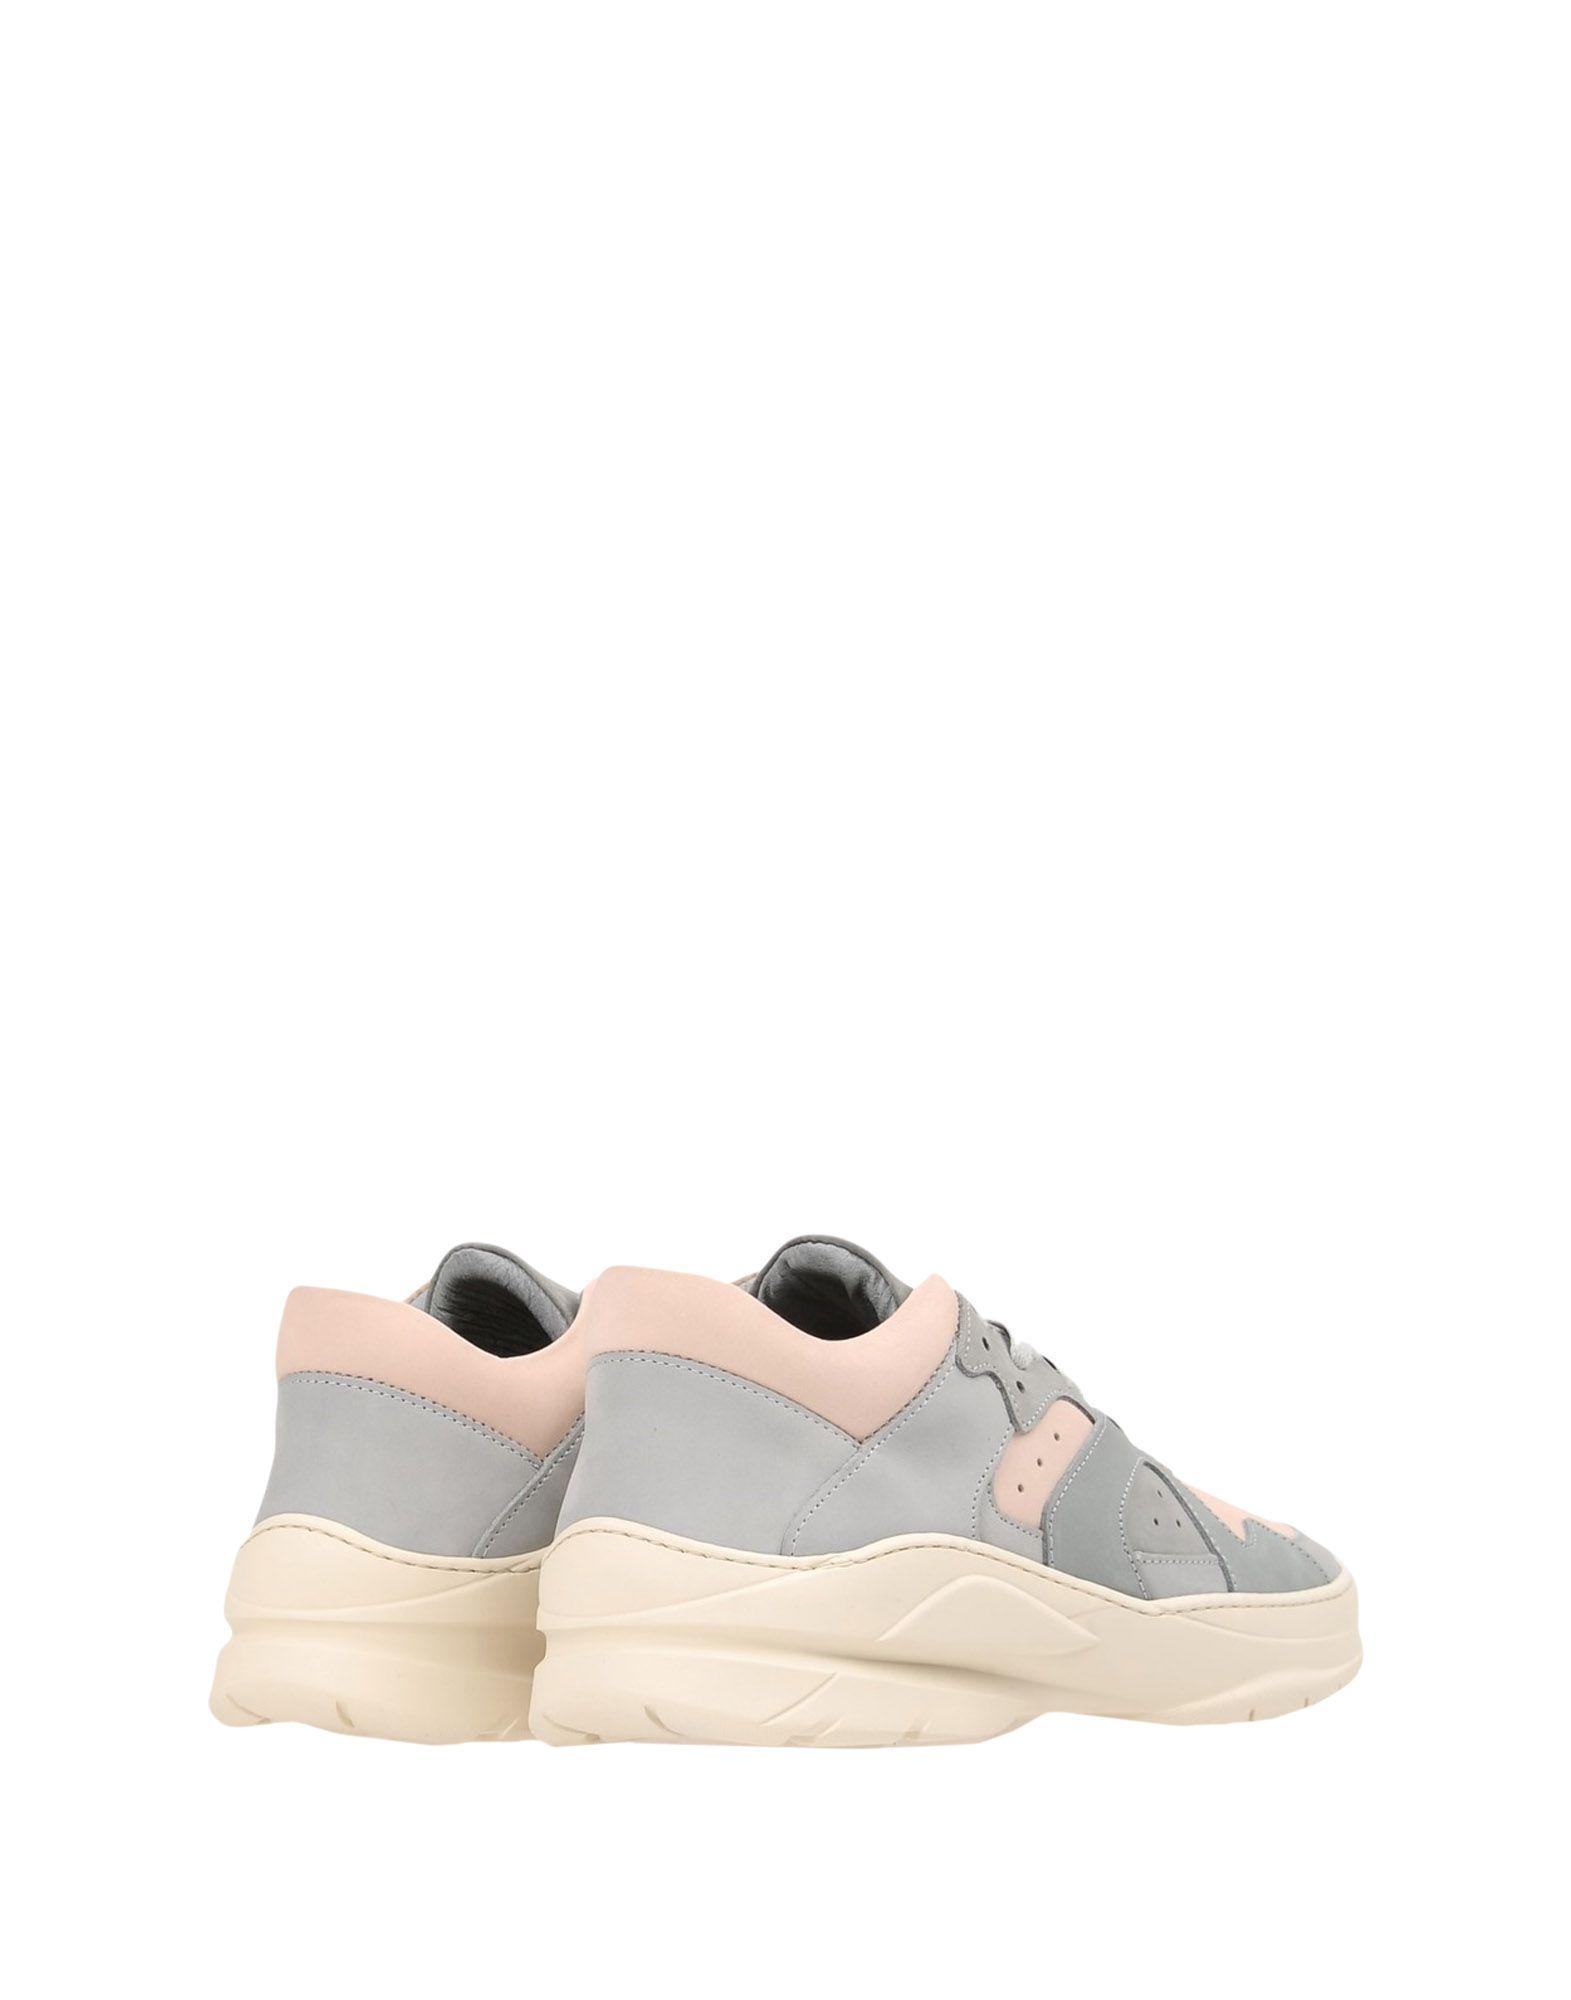 Filling Pieces Pieces Sneakers - Men Filling Pieces Pieces Sneakers online on  Australia - 11364318PC 06092c